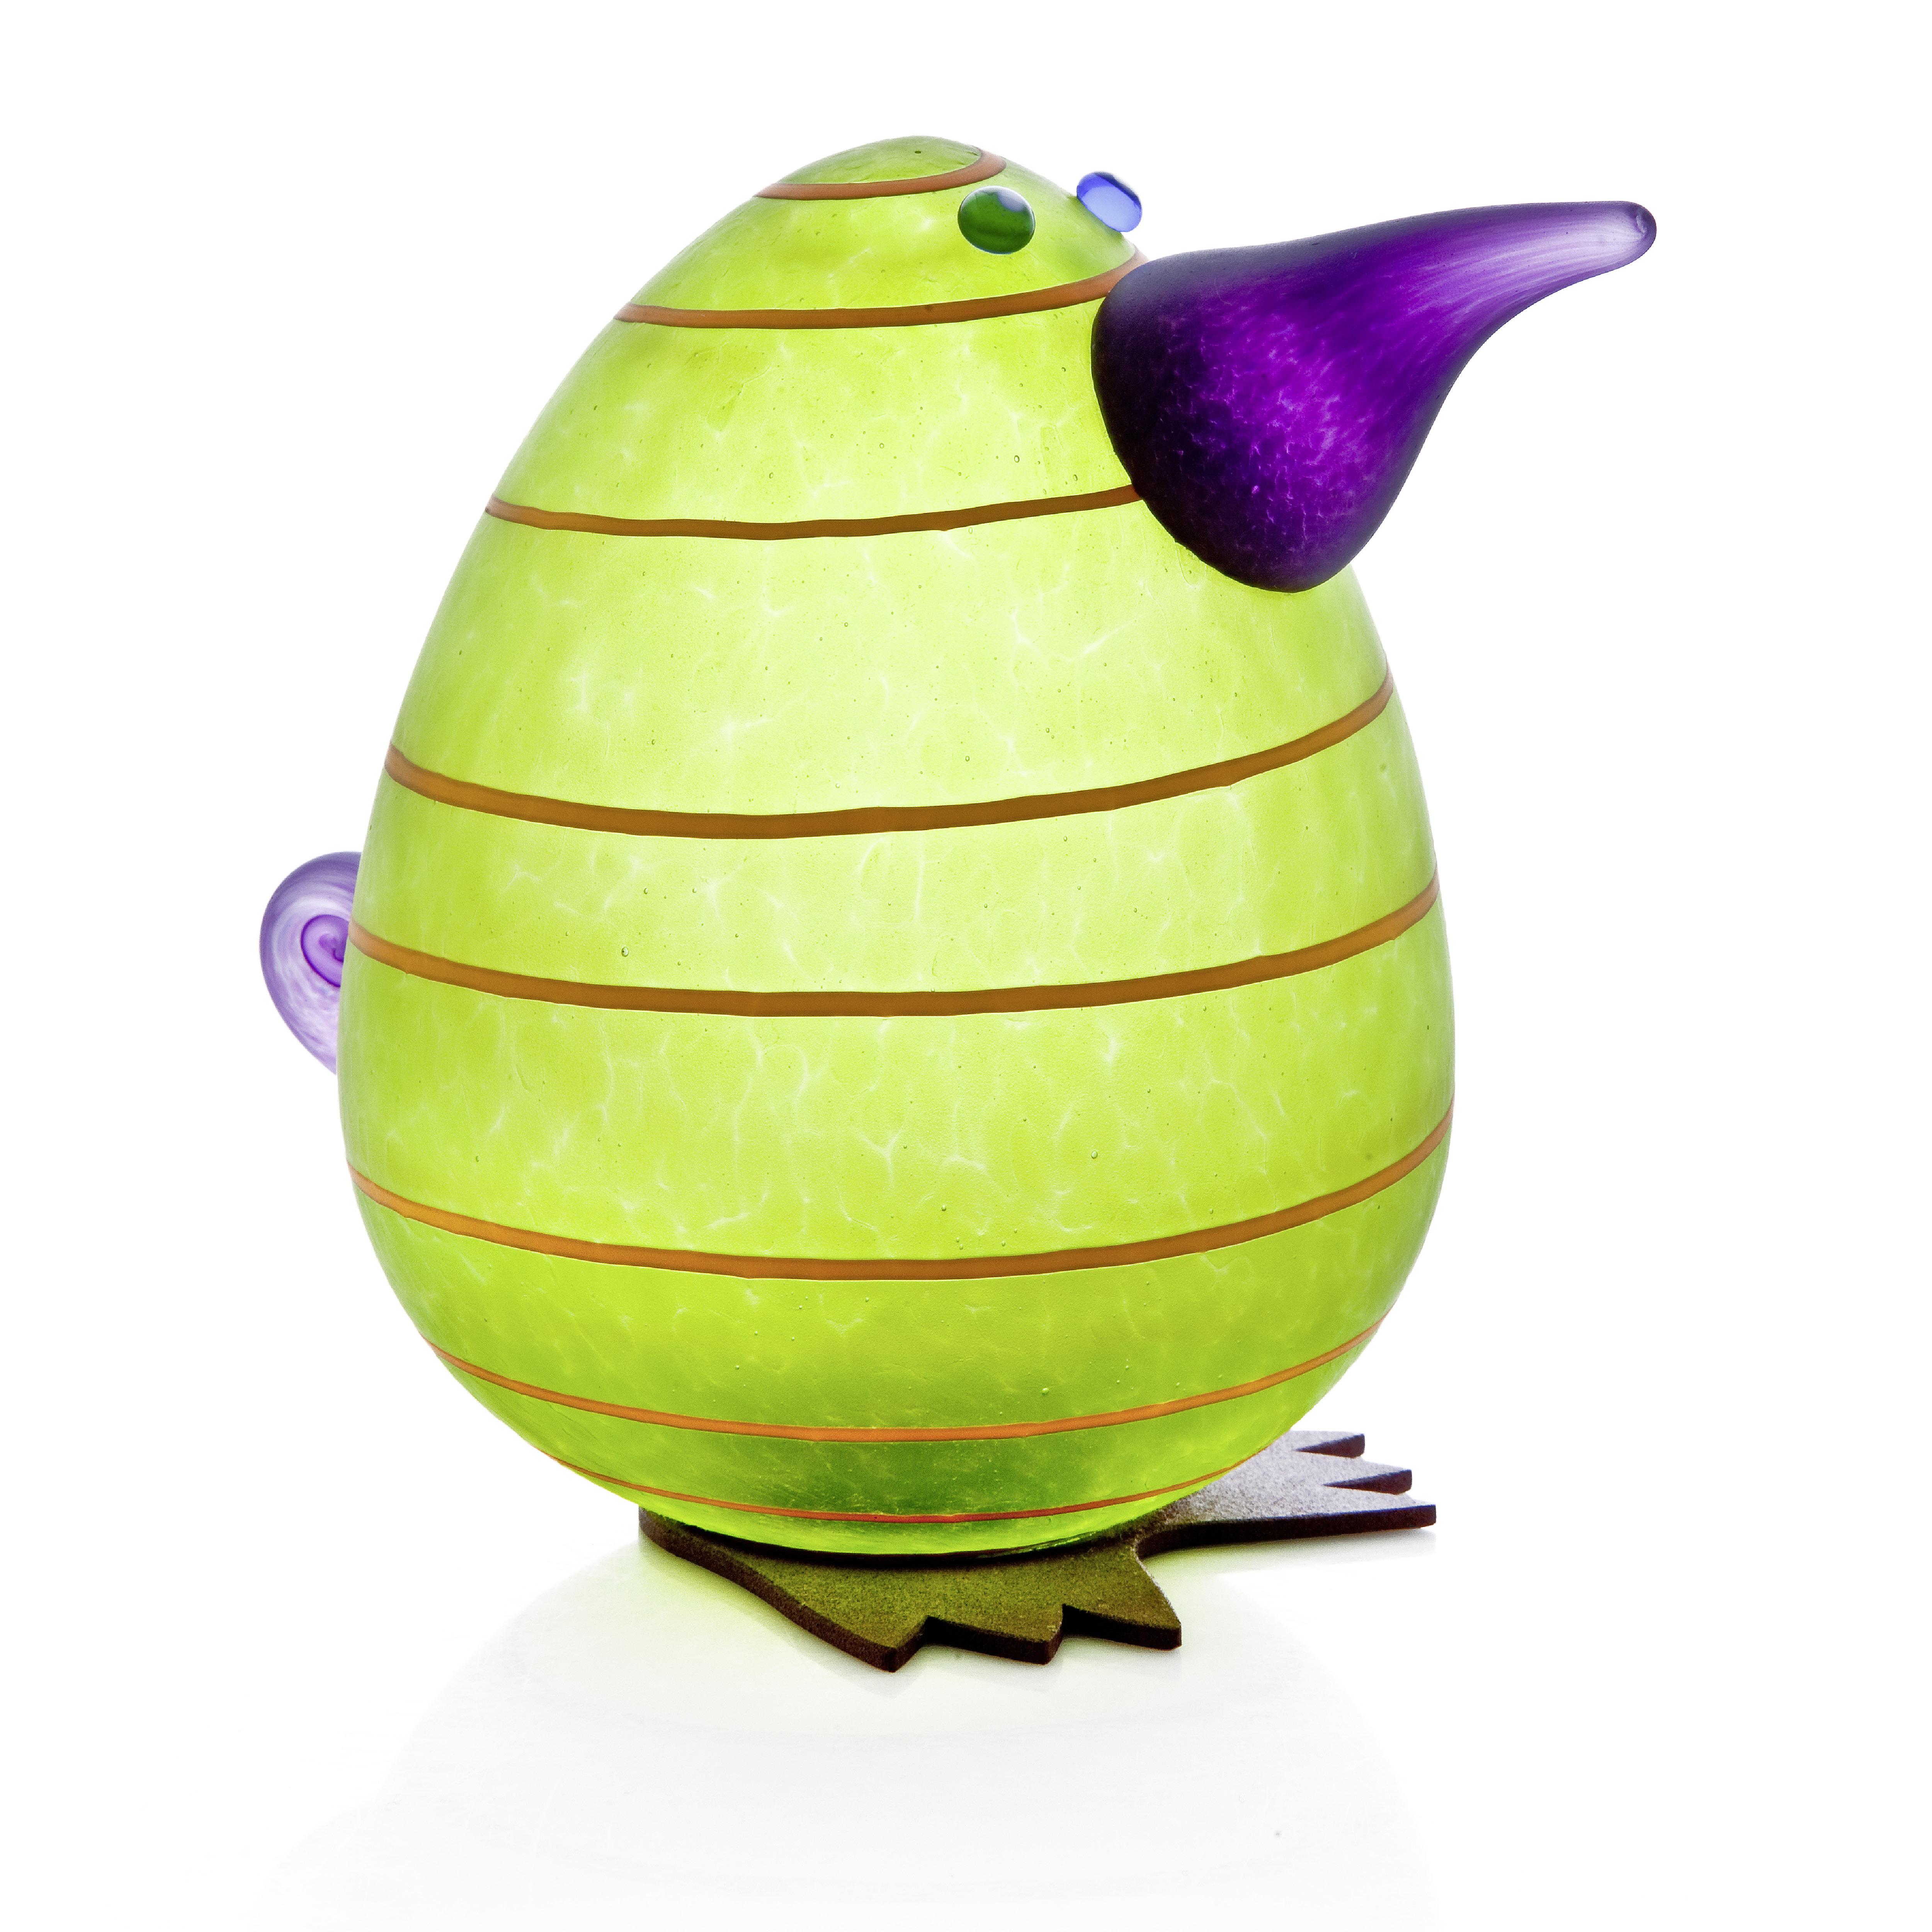 Kiwi Egg, zitro